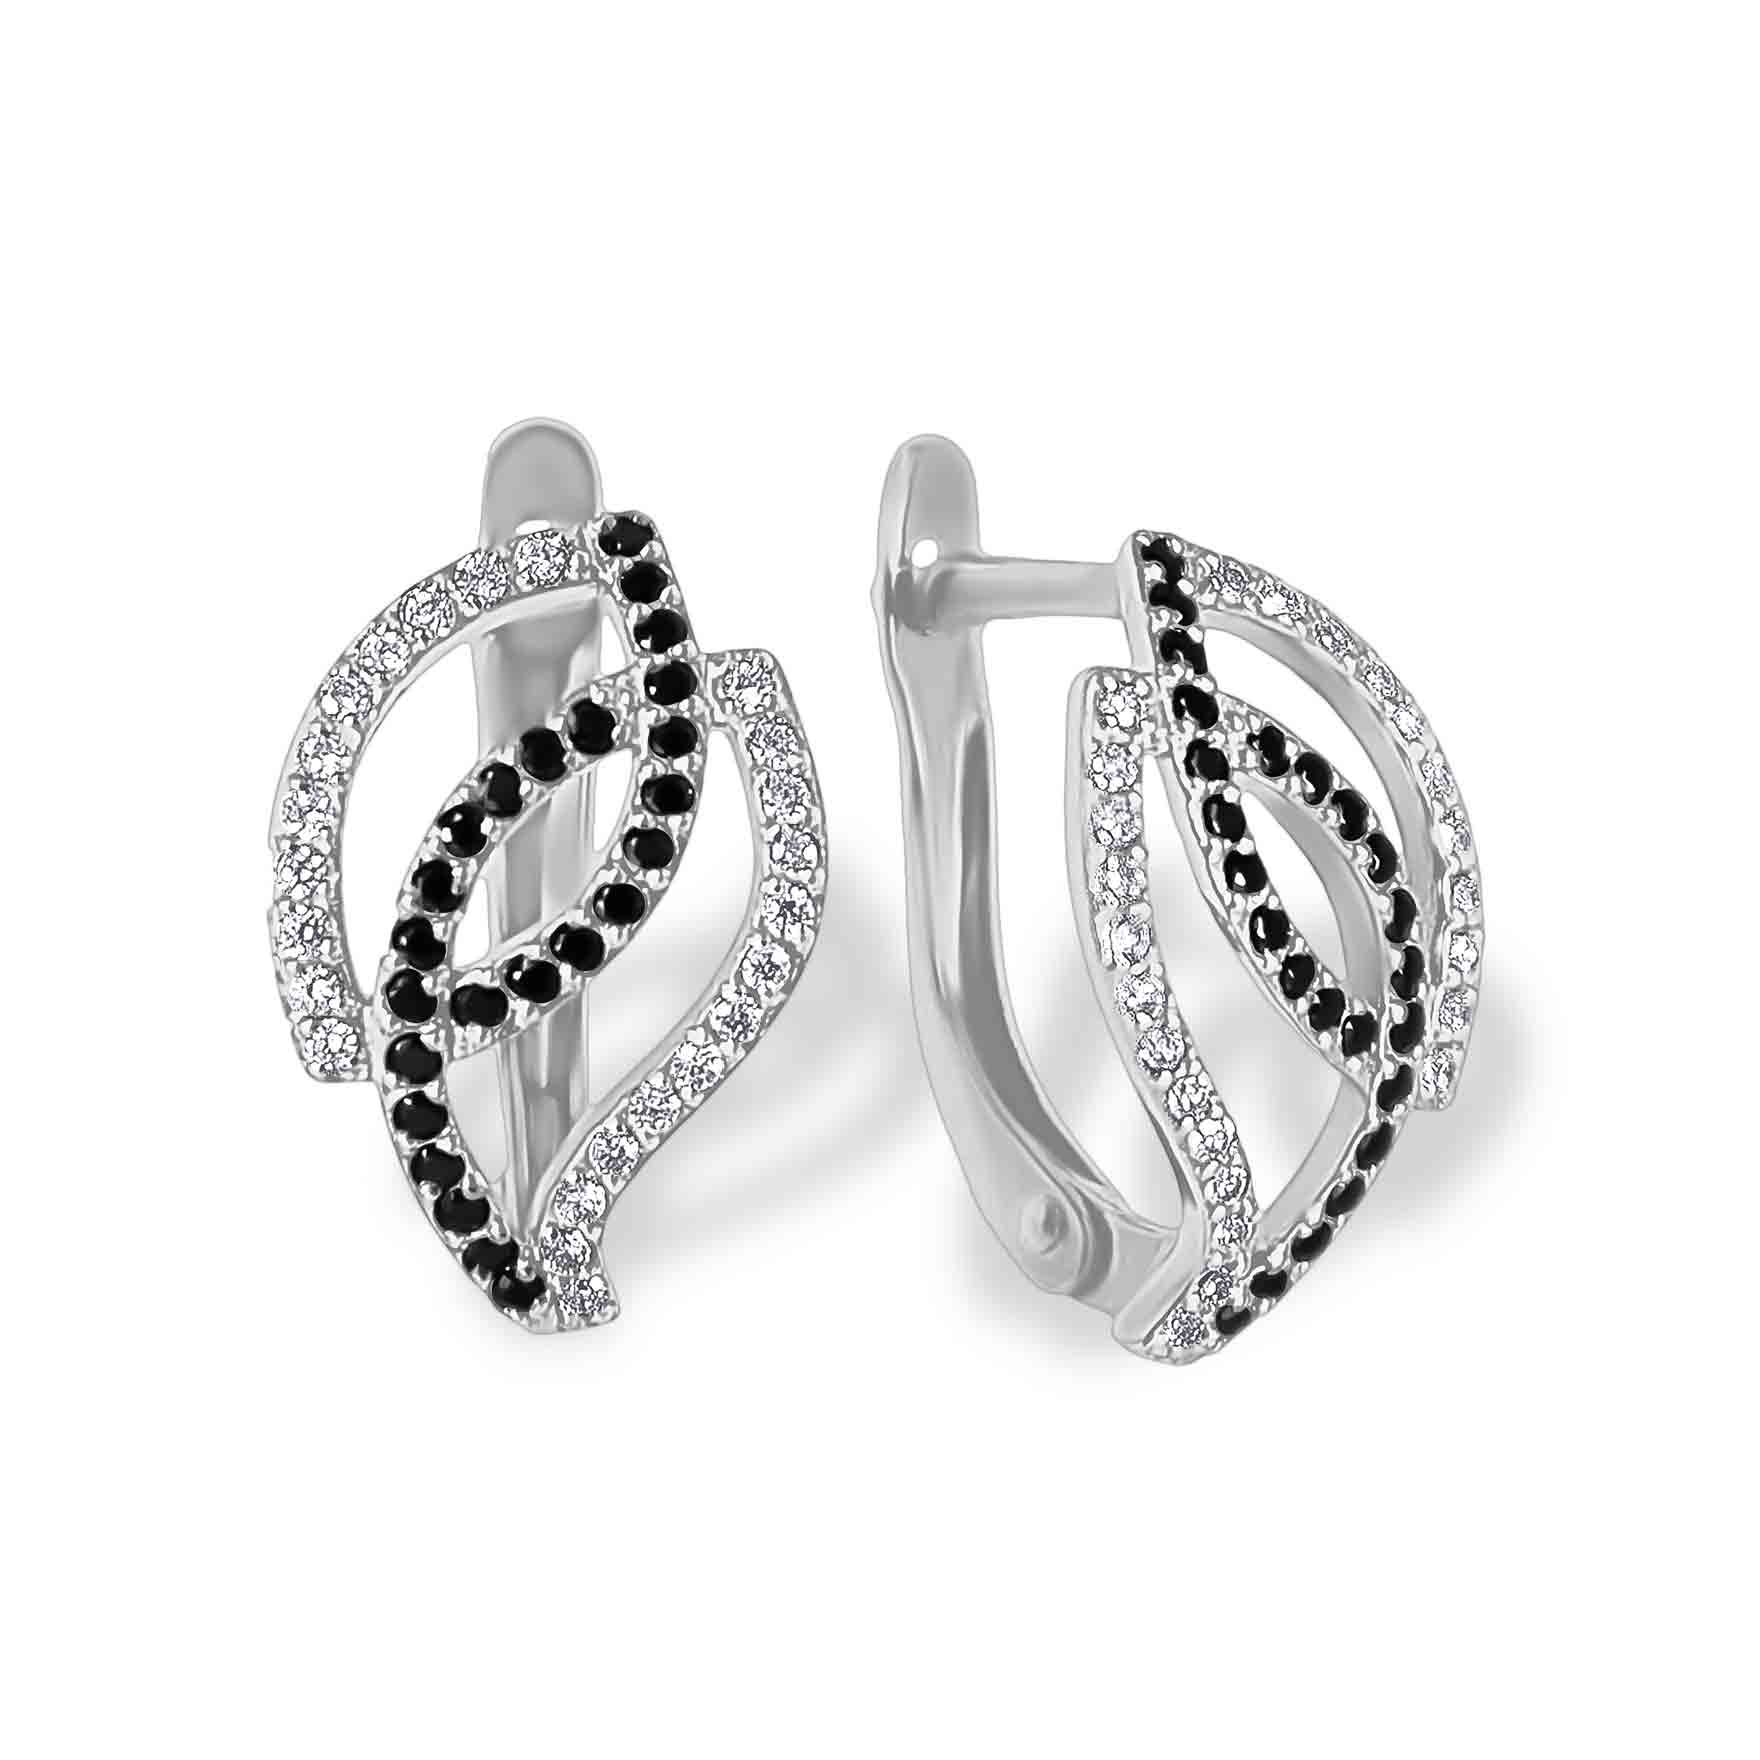 Cz White Gold Leverback Earrings